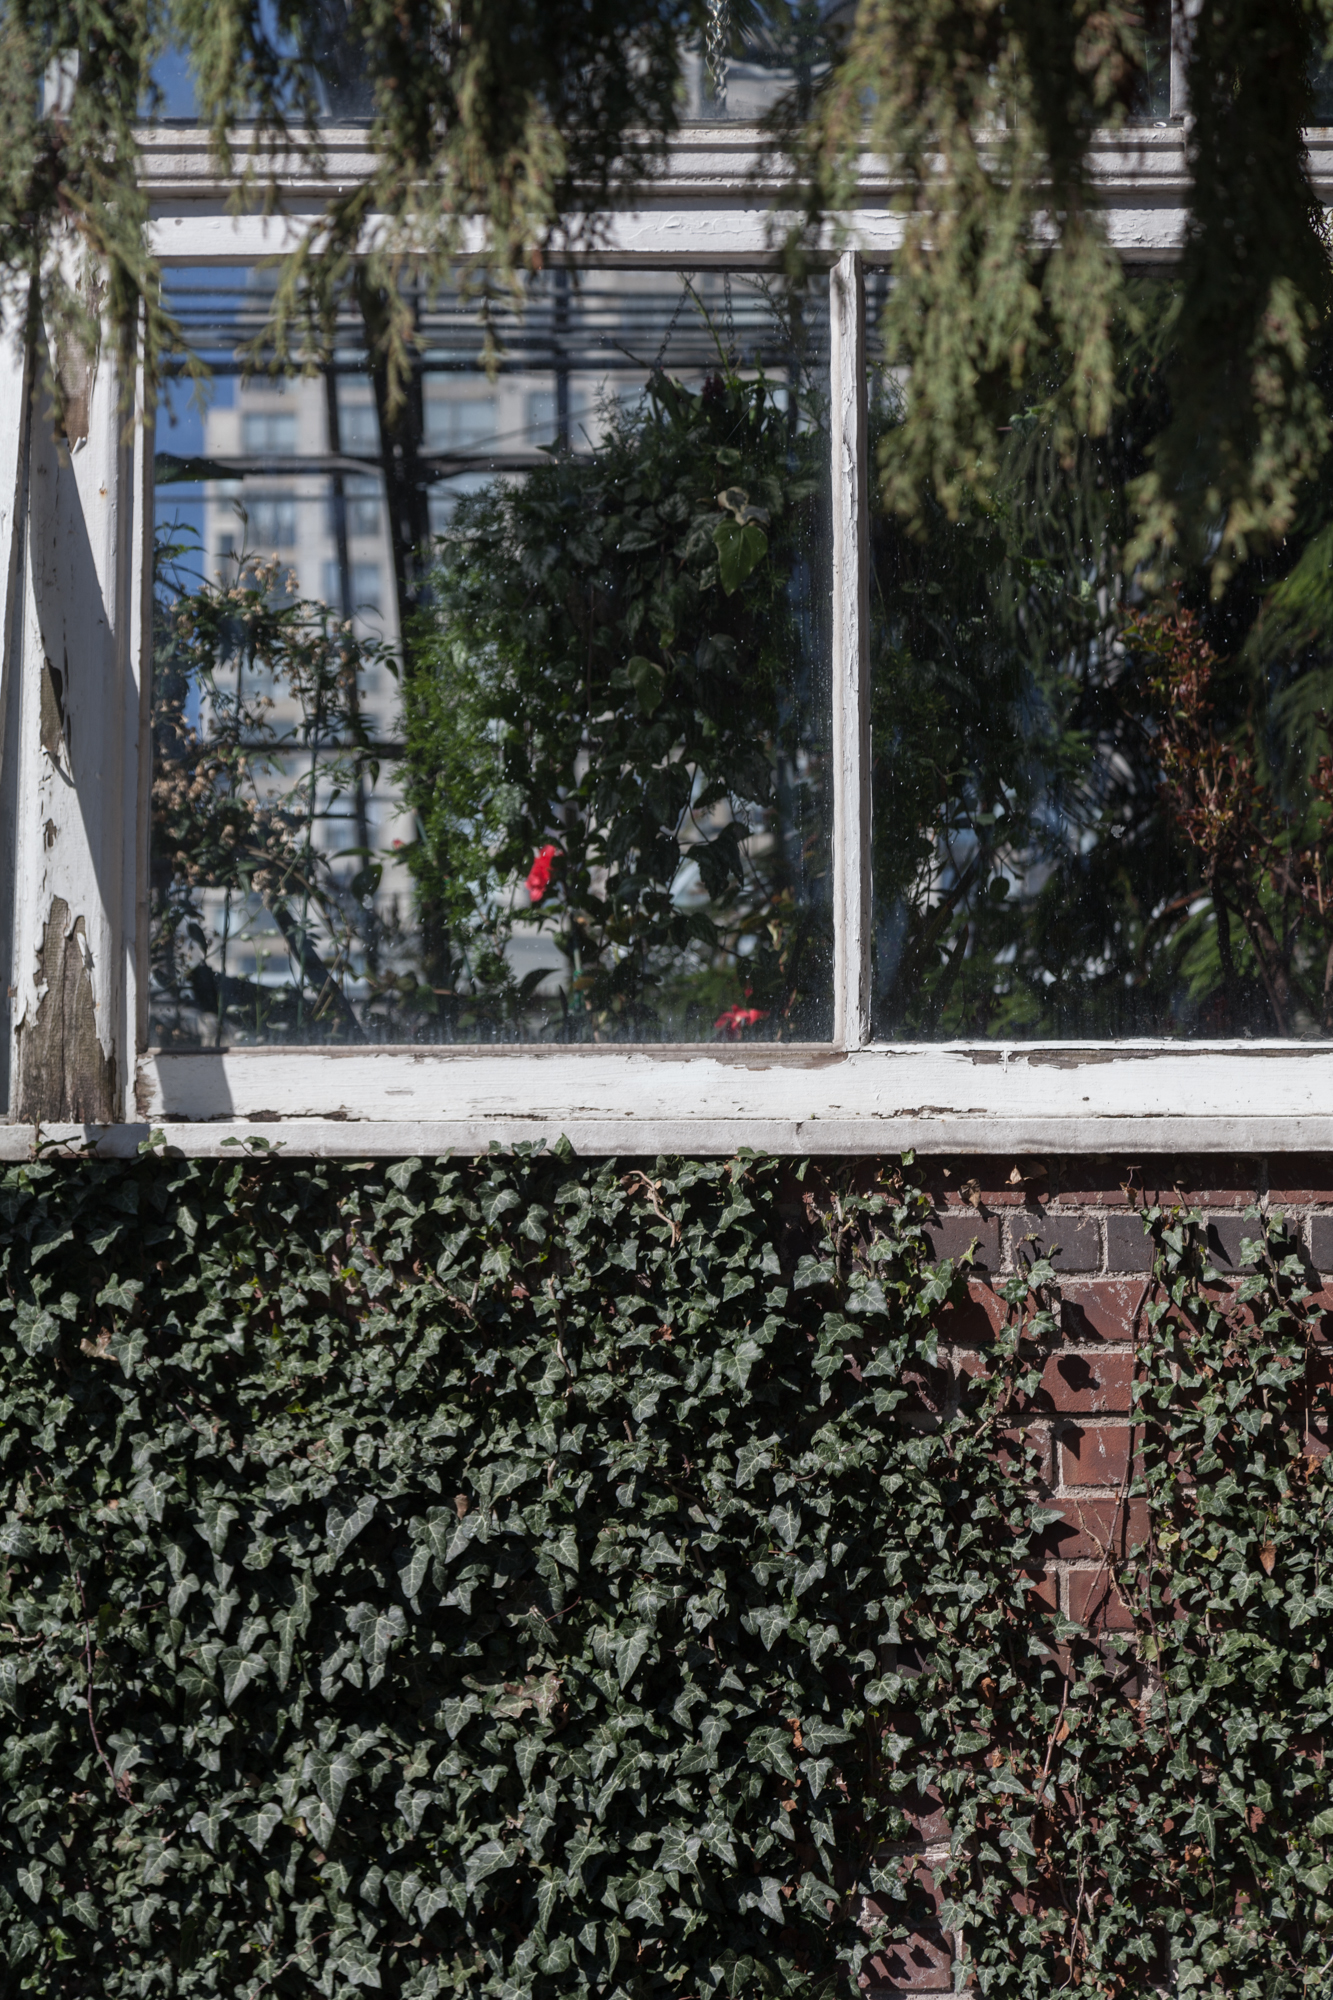 Allan-Garden-Conservatory-outside.jpg